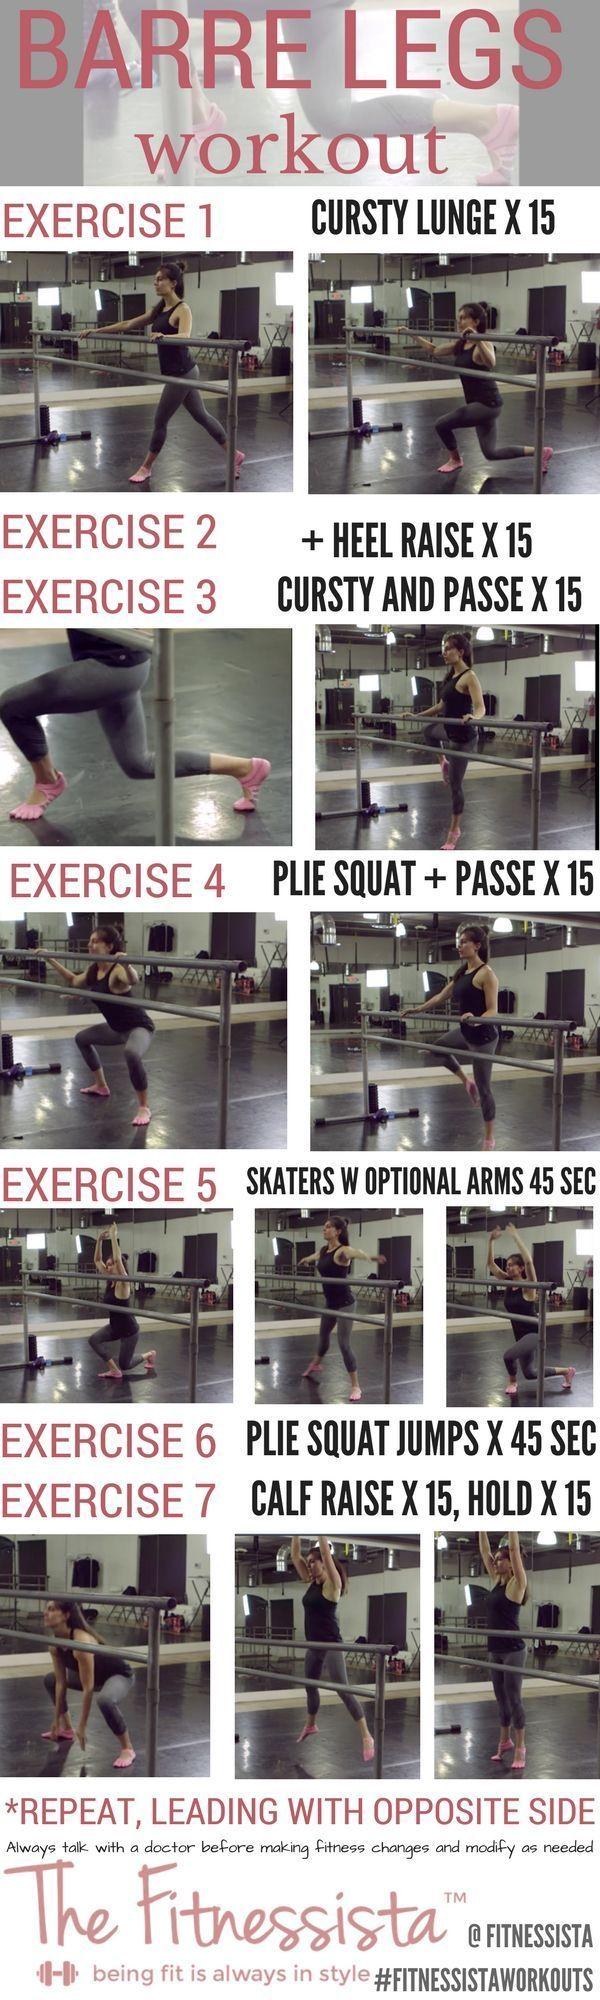 Barre Legs Workout